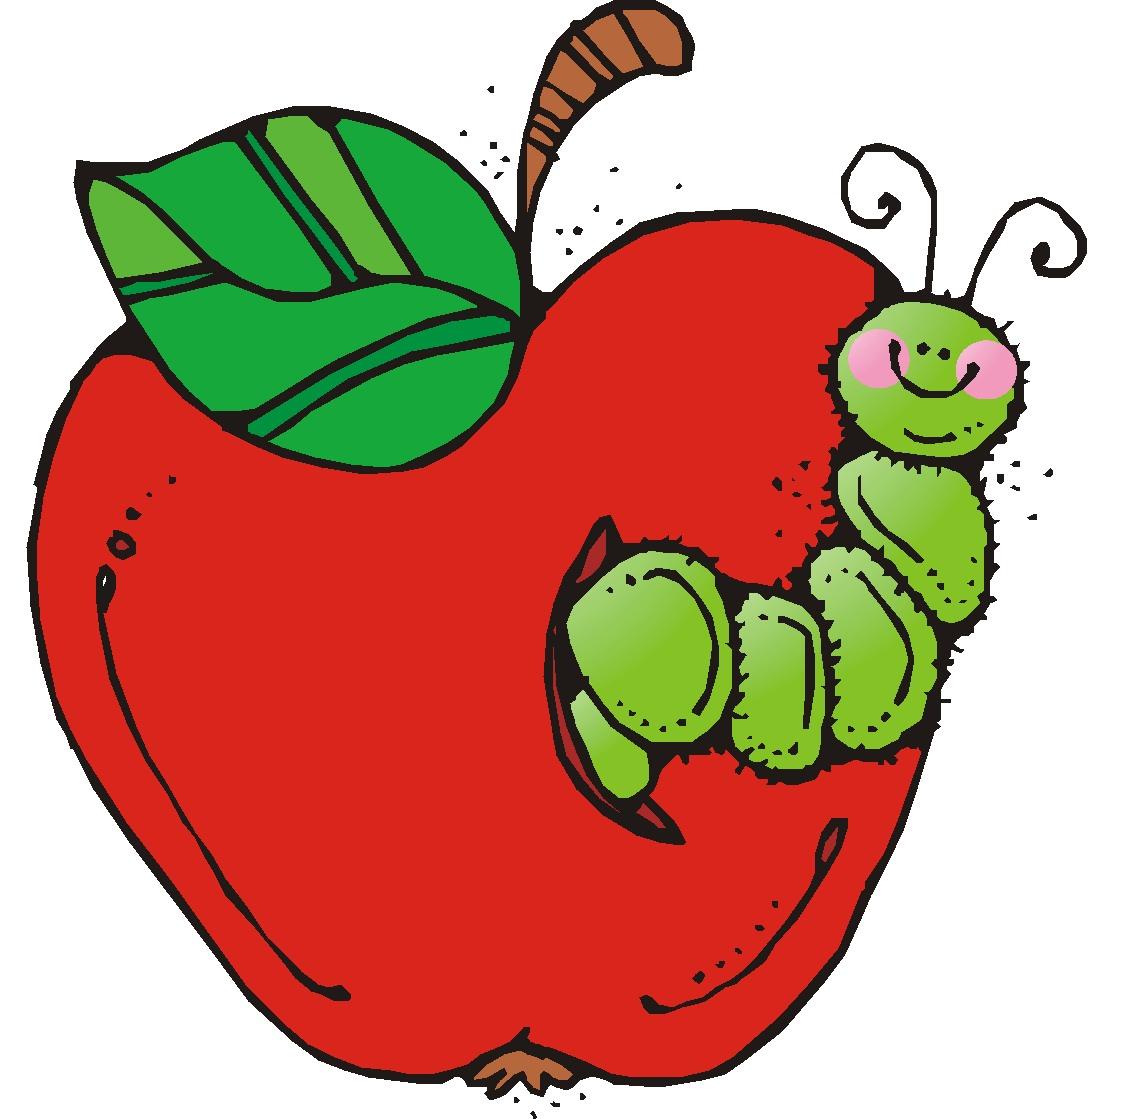 1125x1119 Cute Apple Clip Art Free Clipart Images